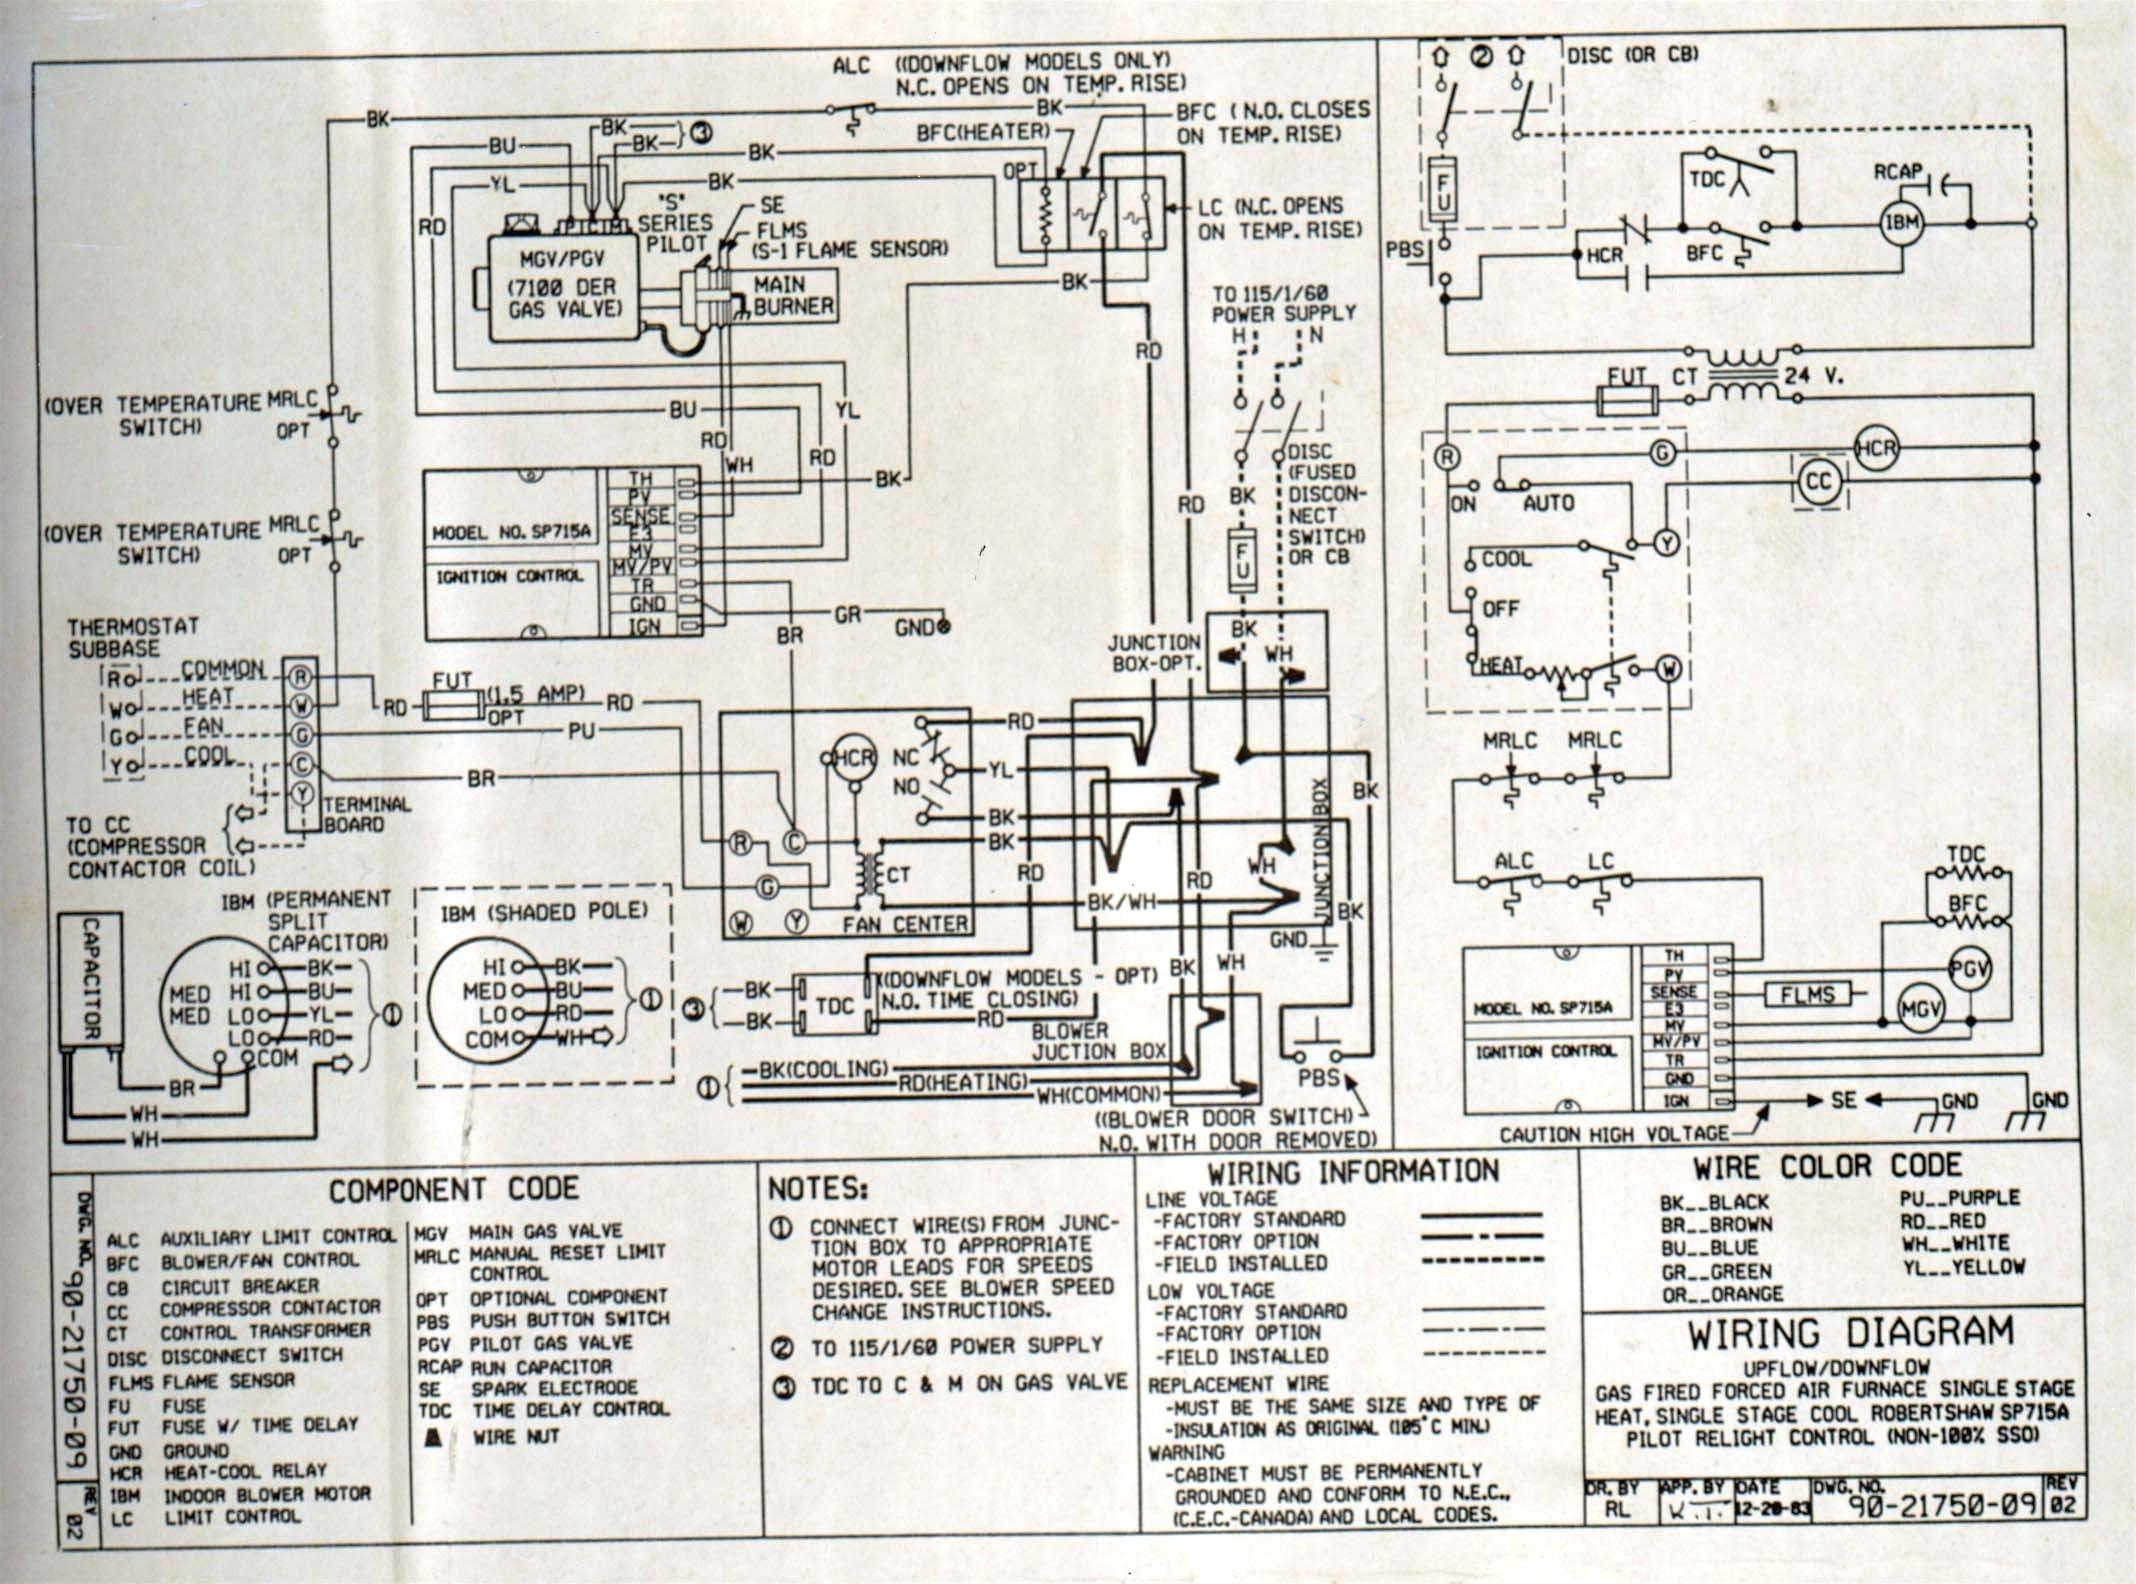 Wiring Diagram for Ac to Furnace Inspirationa Payne Electric Furnace Wiring Diagram Inspirationa Payne Air Handler